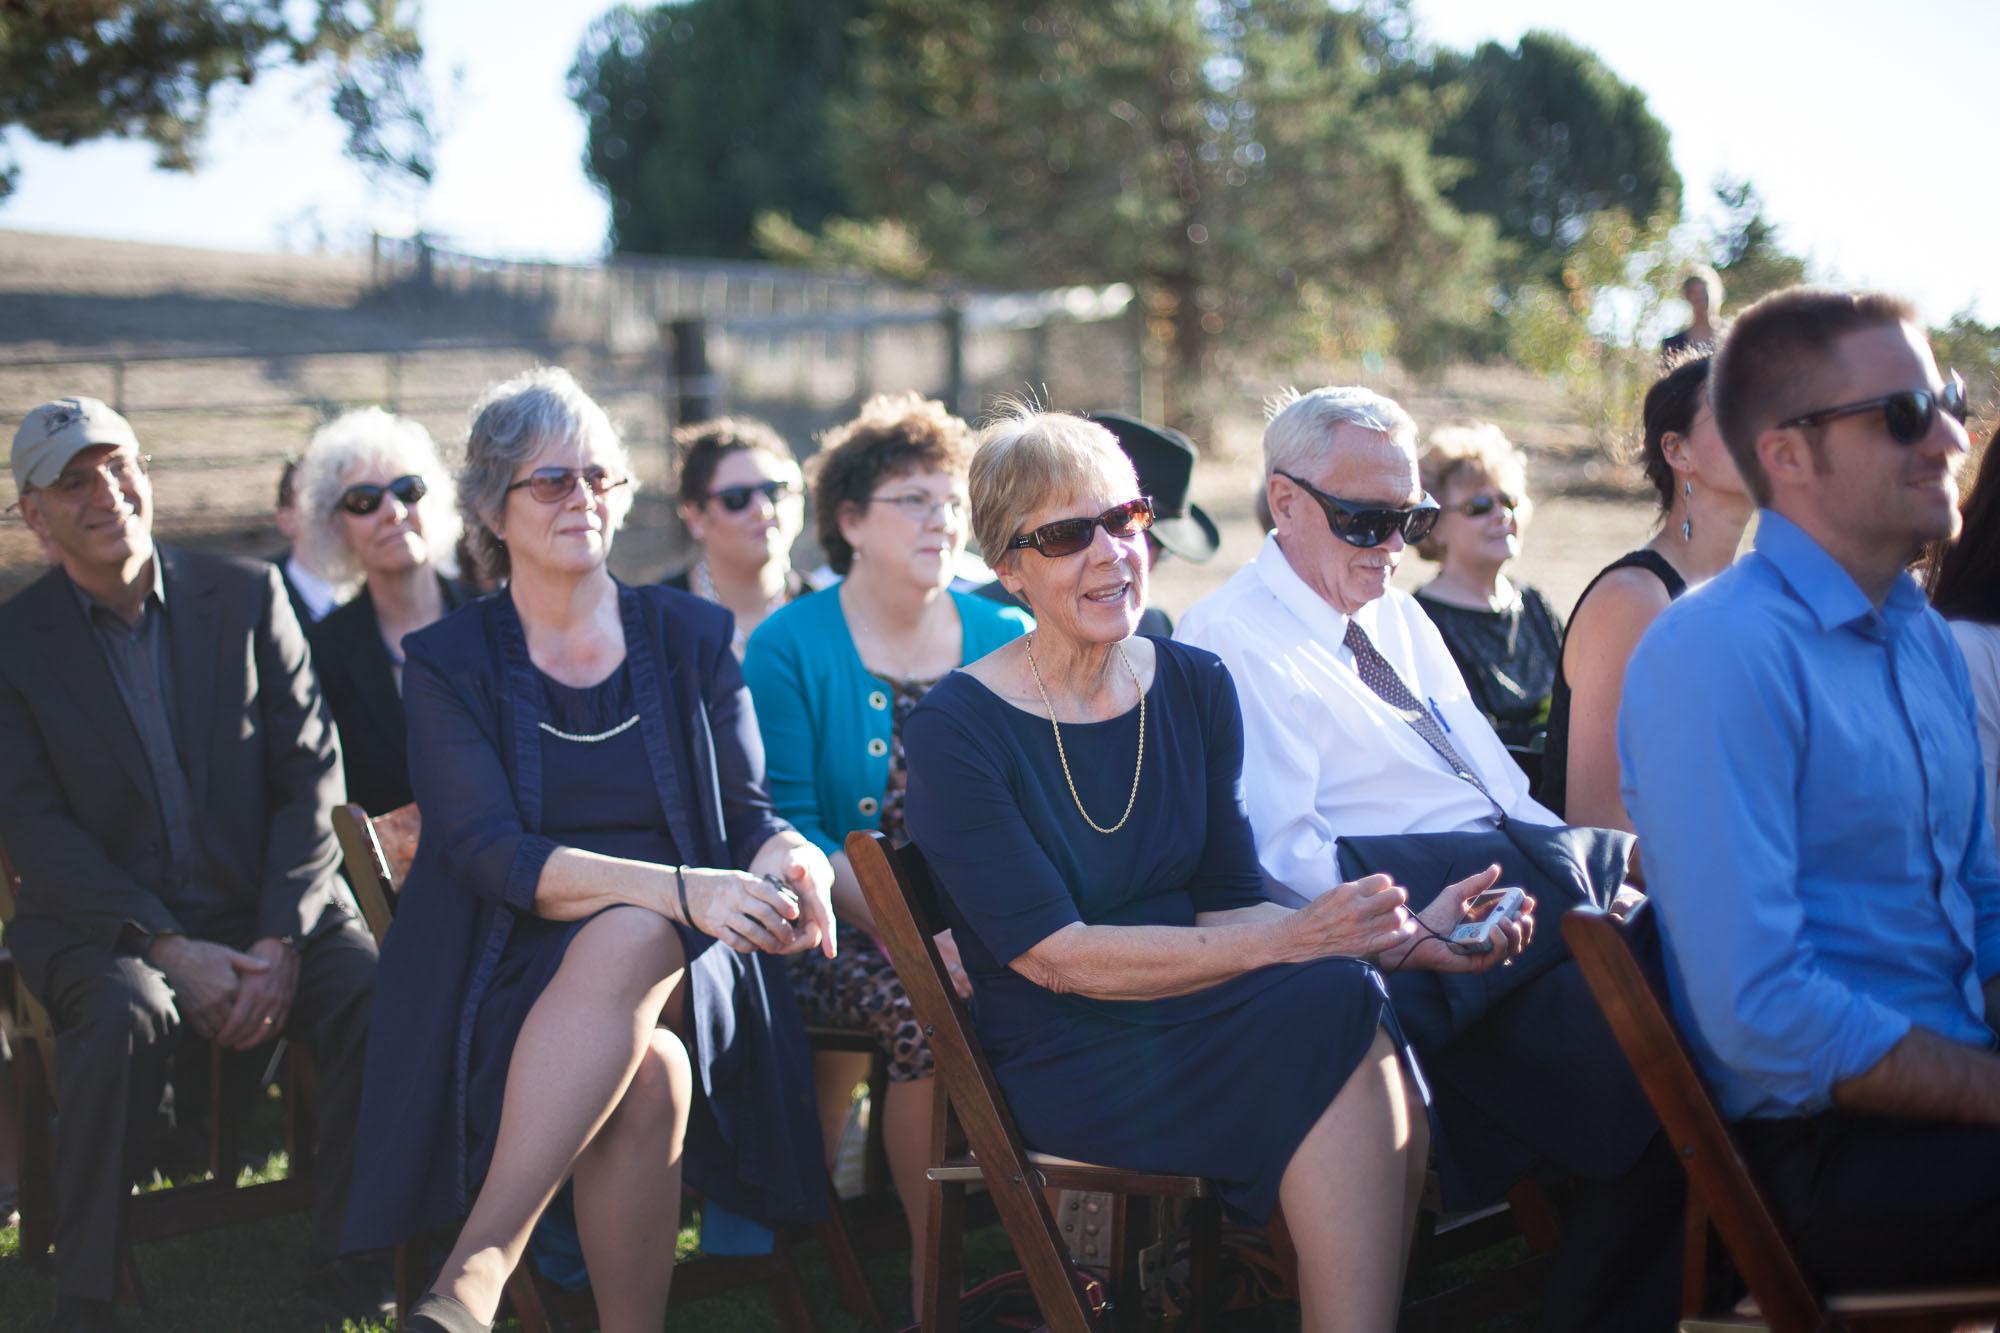 Gretchen_Gause_Petaluma_Olympias_Valley_Wedding_Photo-165.jpg